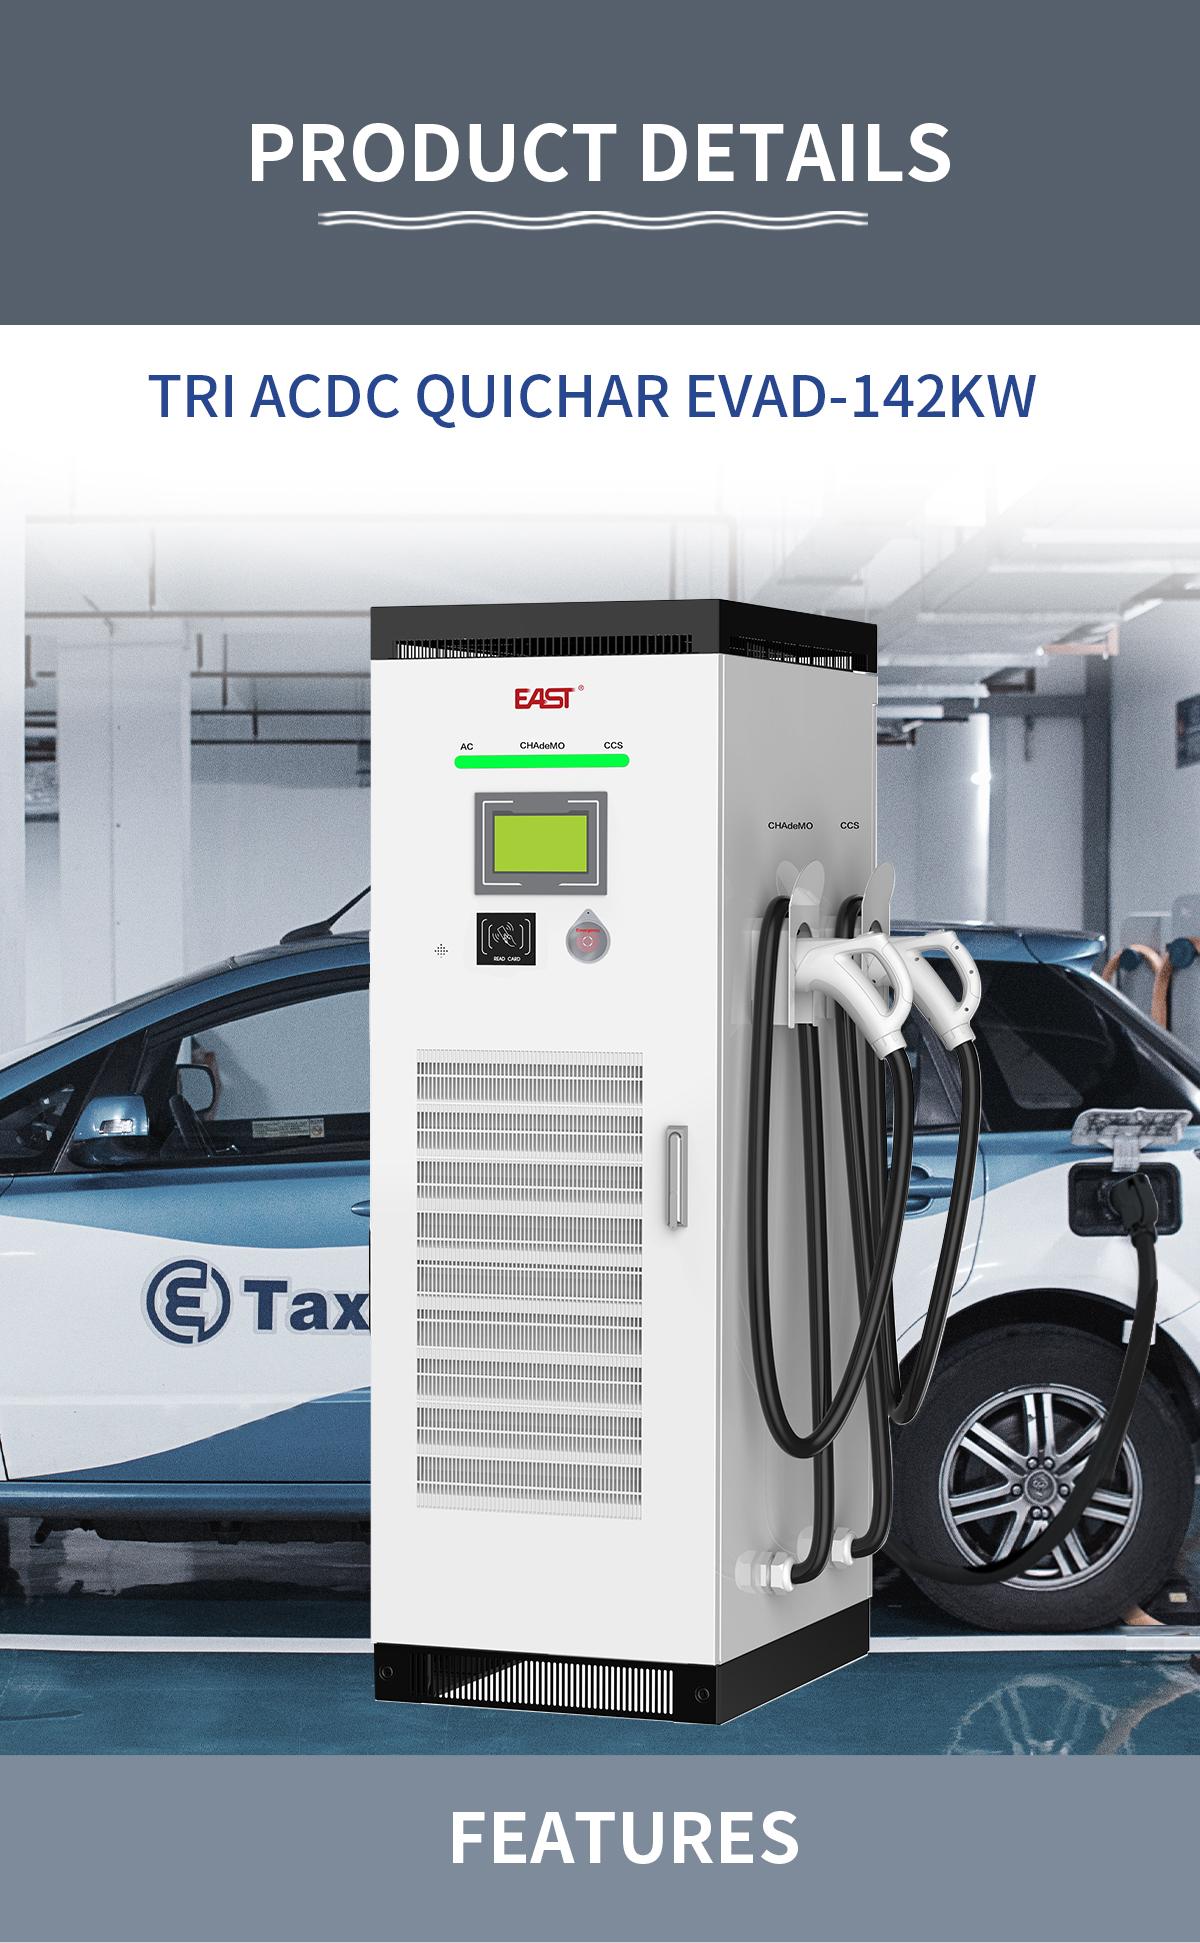 Tri-ACDC-QUICHAR-EVAD-142KW-(产品主图)_01(1).jpg